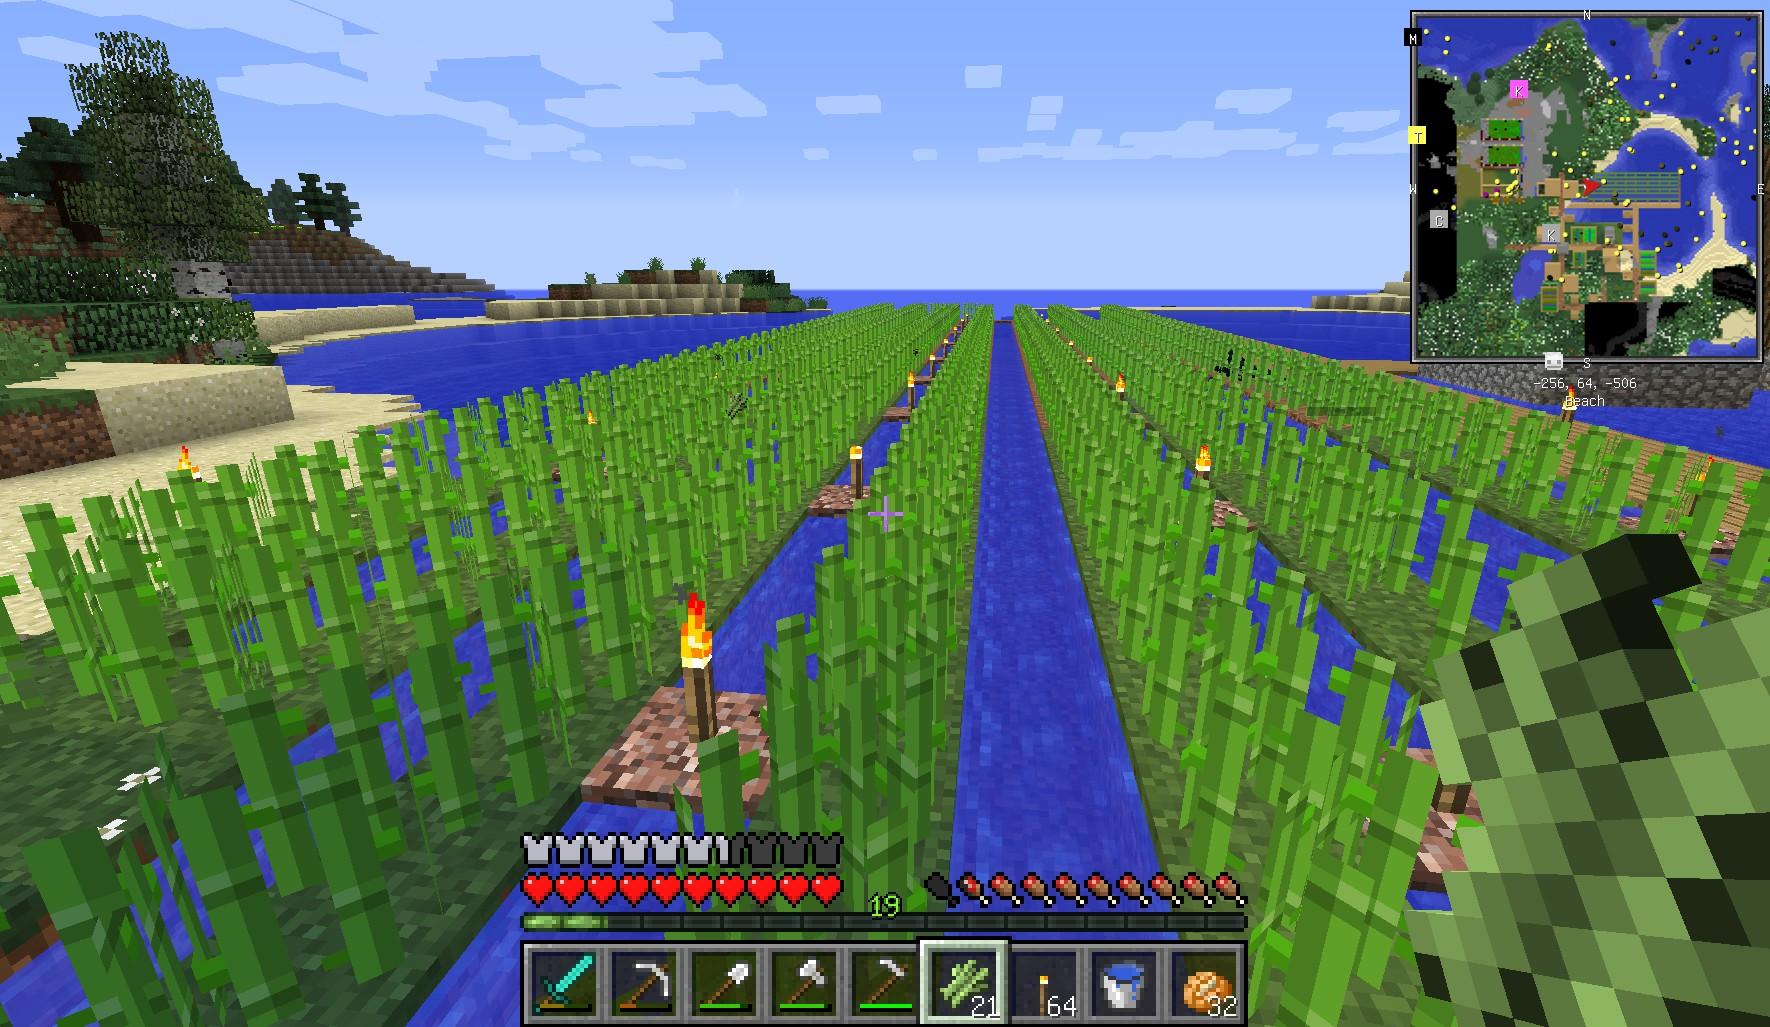 minecraft_059.jpg